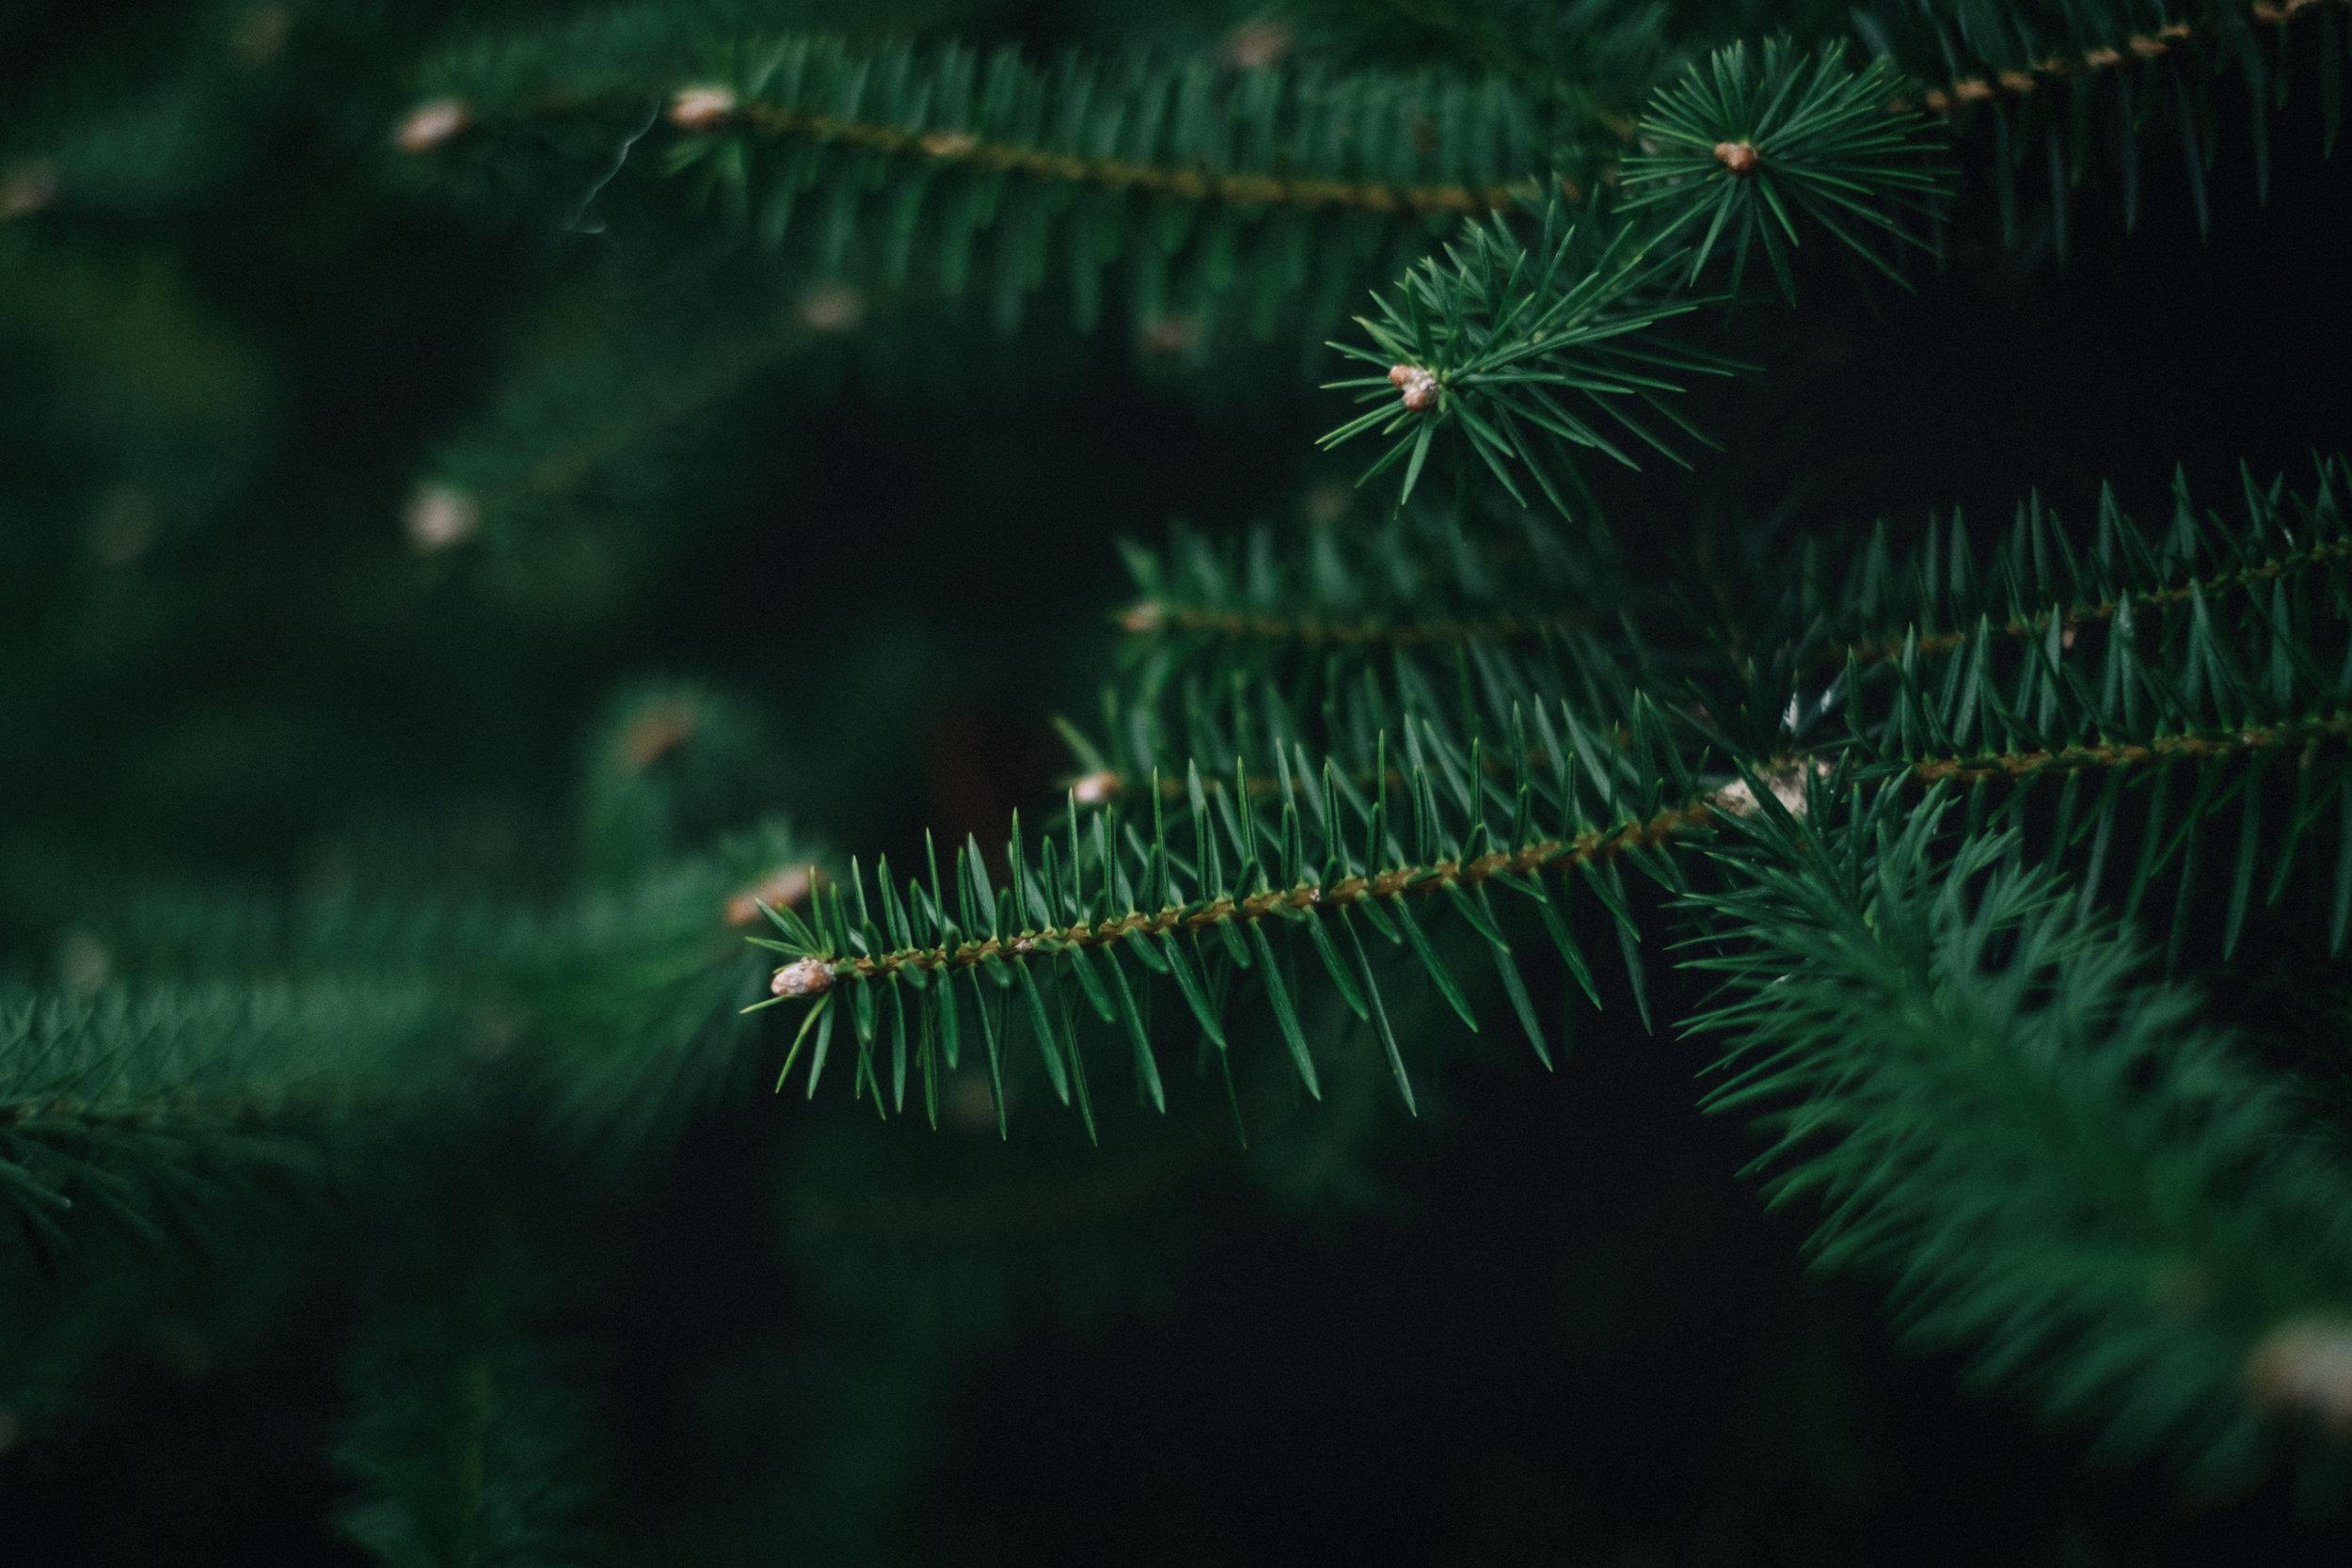 Close up of a fern tree